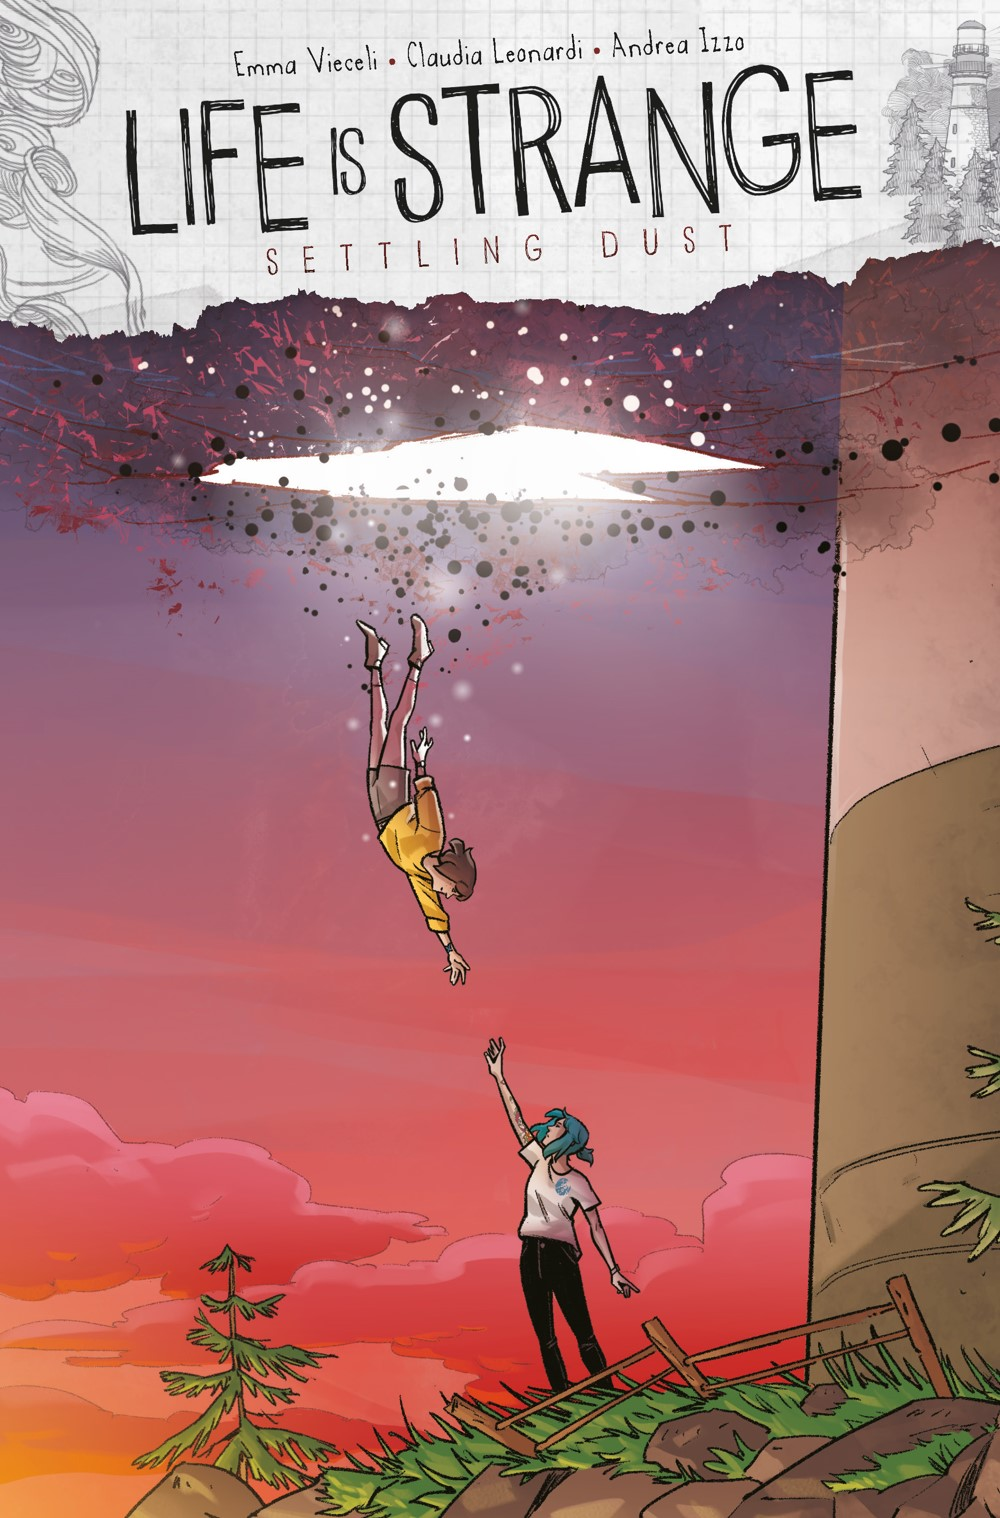 LIFE-IS-STRANGE-SETTLING-DUST-2-CVR-C-LEONARDI Titan Comics October 2021 Solicitations